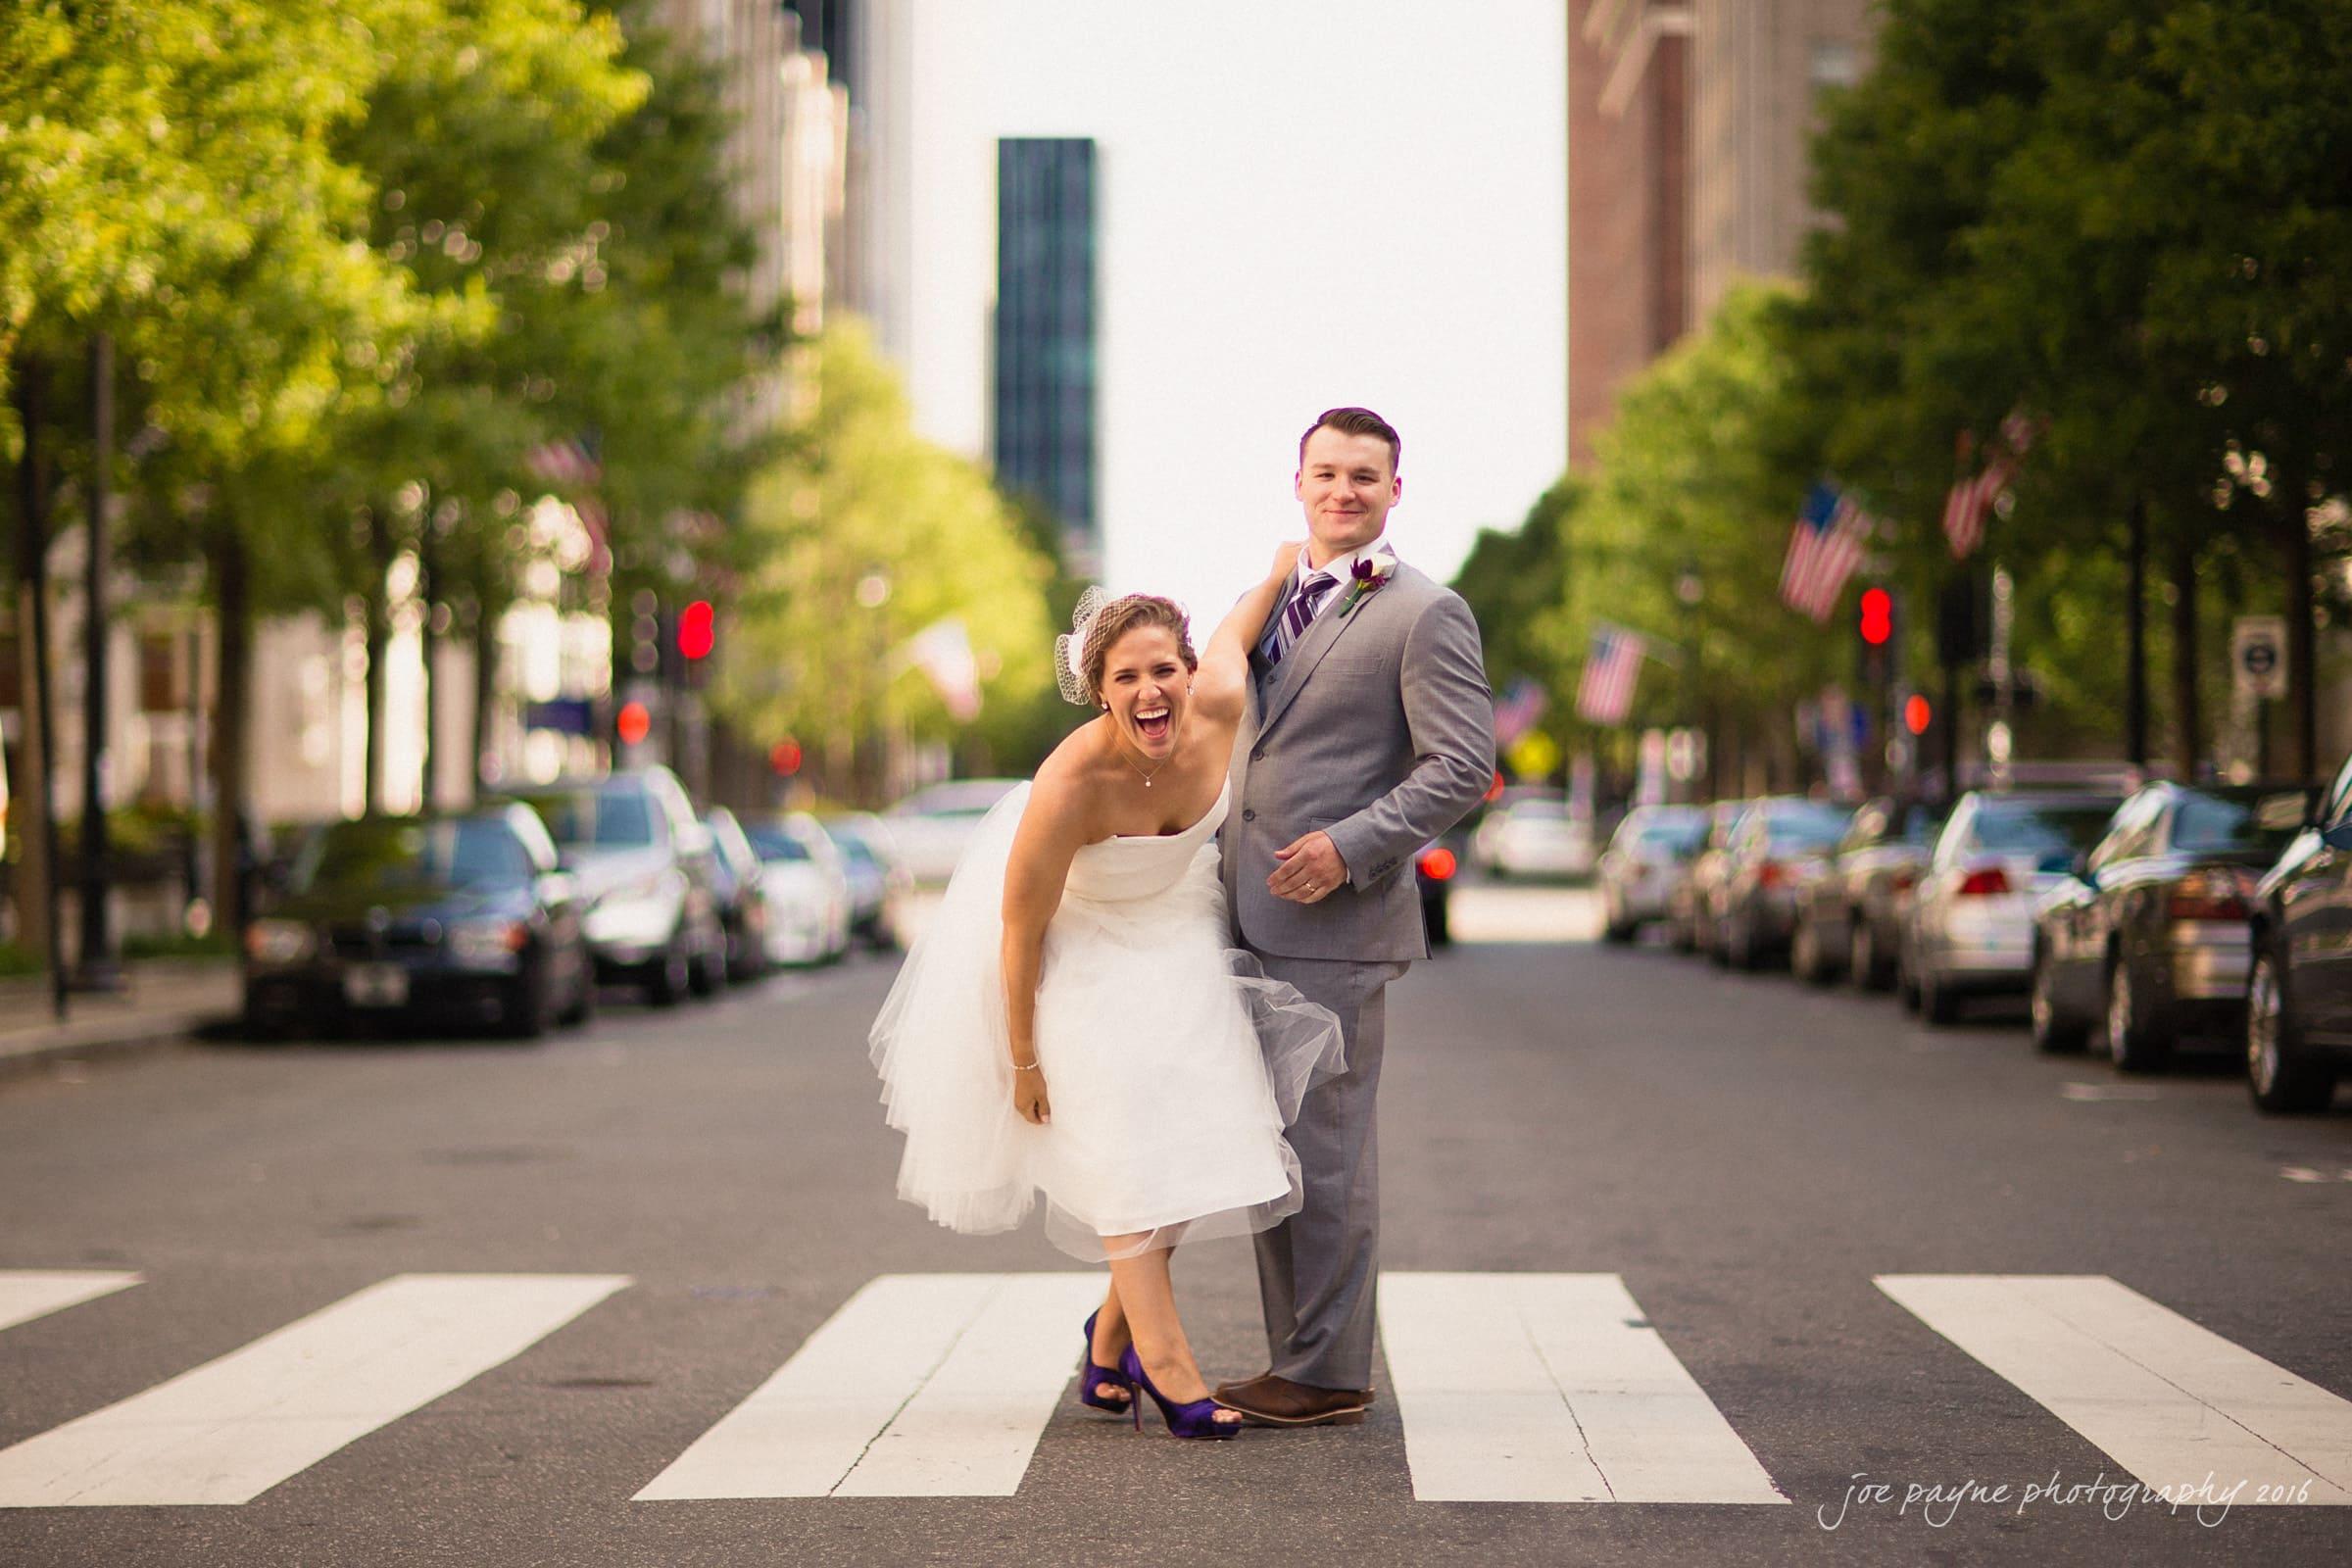 Downtown Raleigh Wedding Photographer - Alexandra & Trent -33